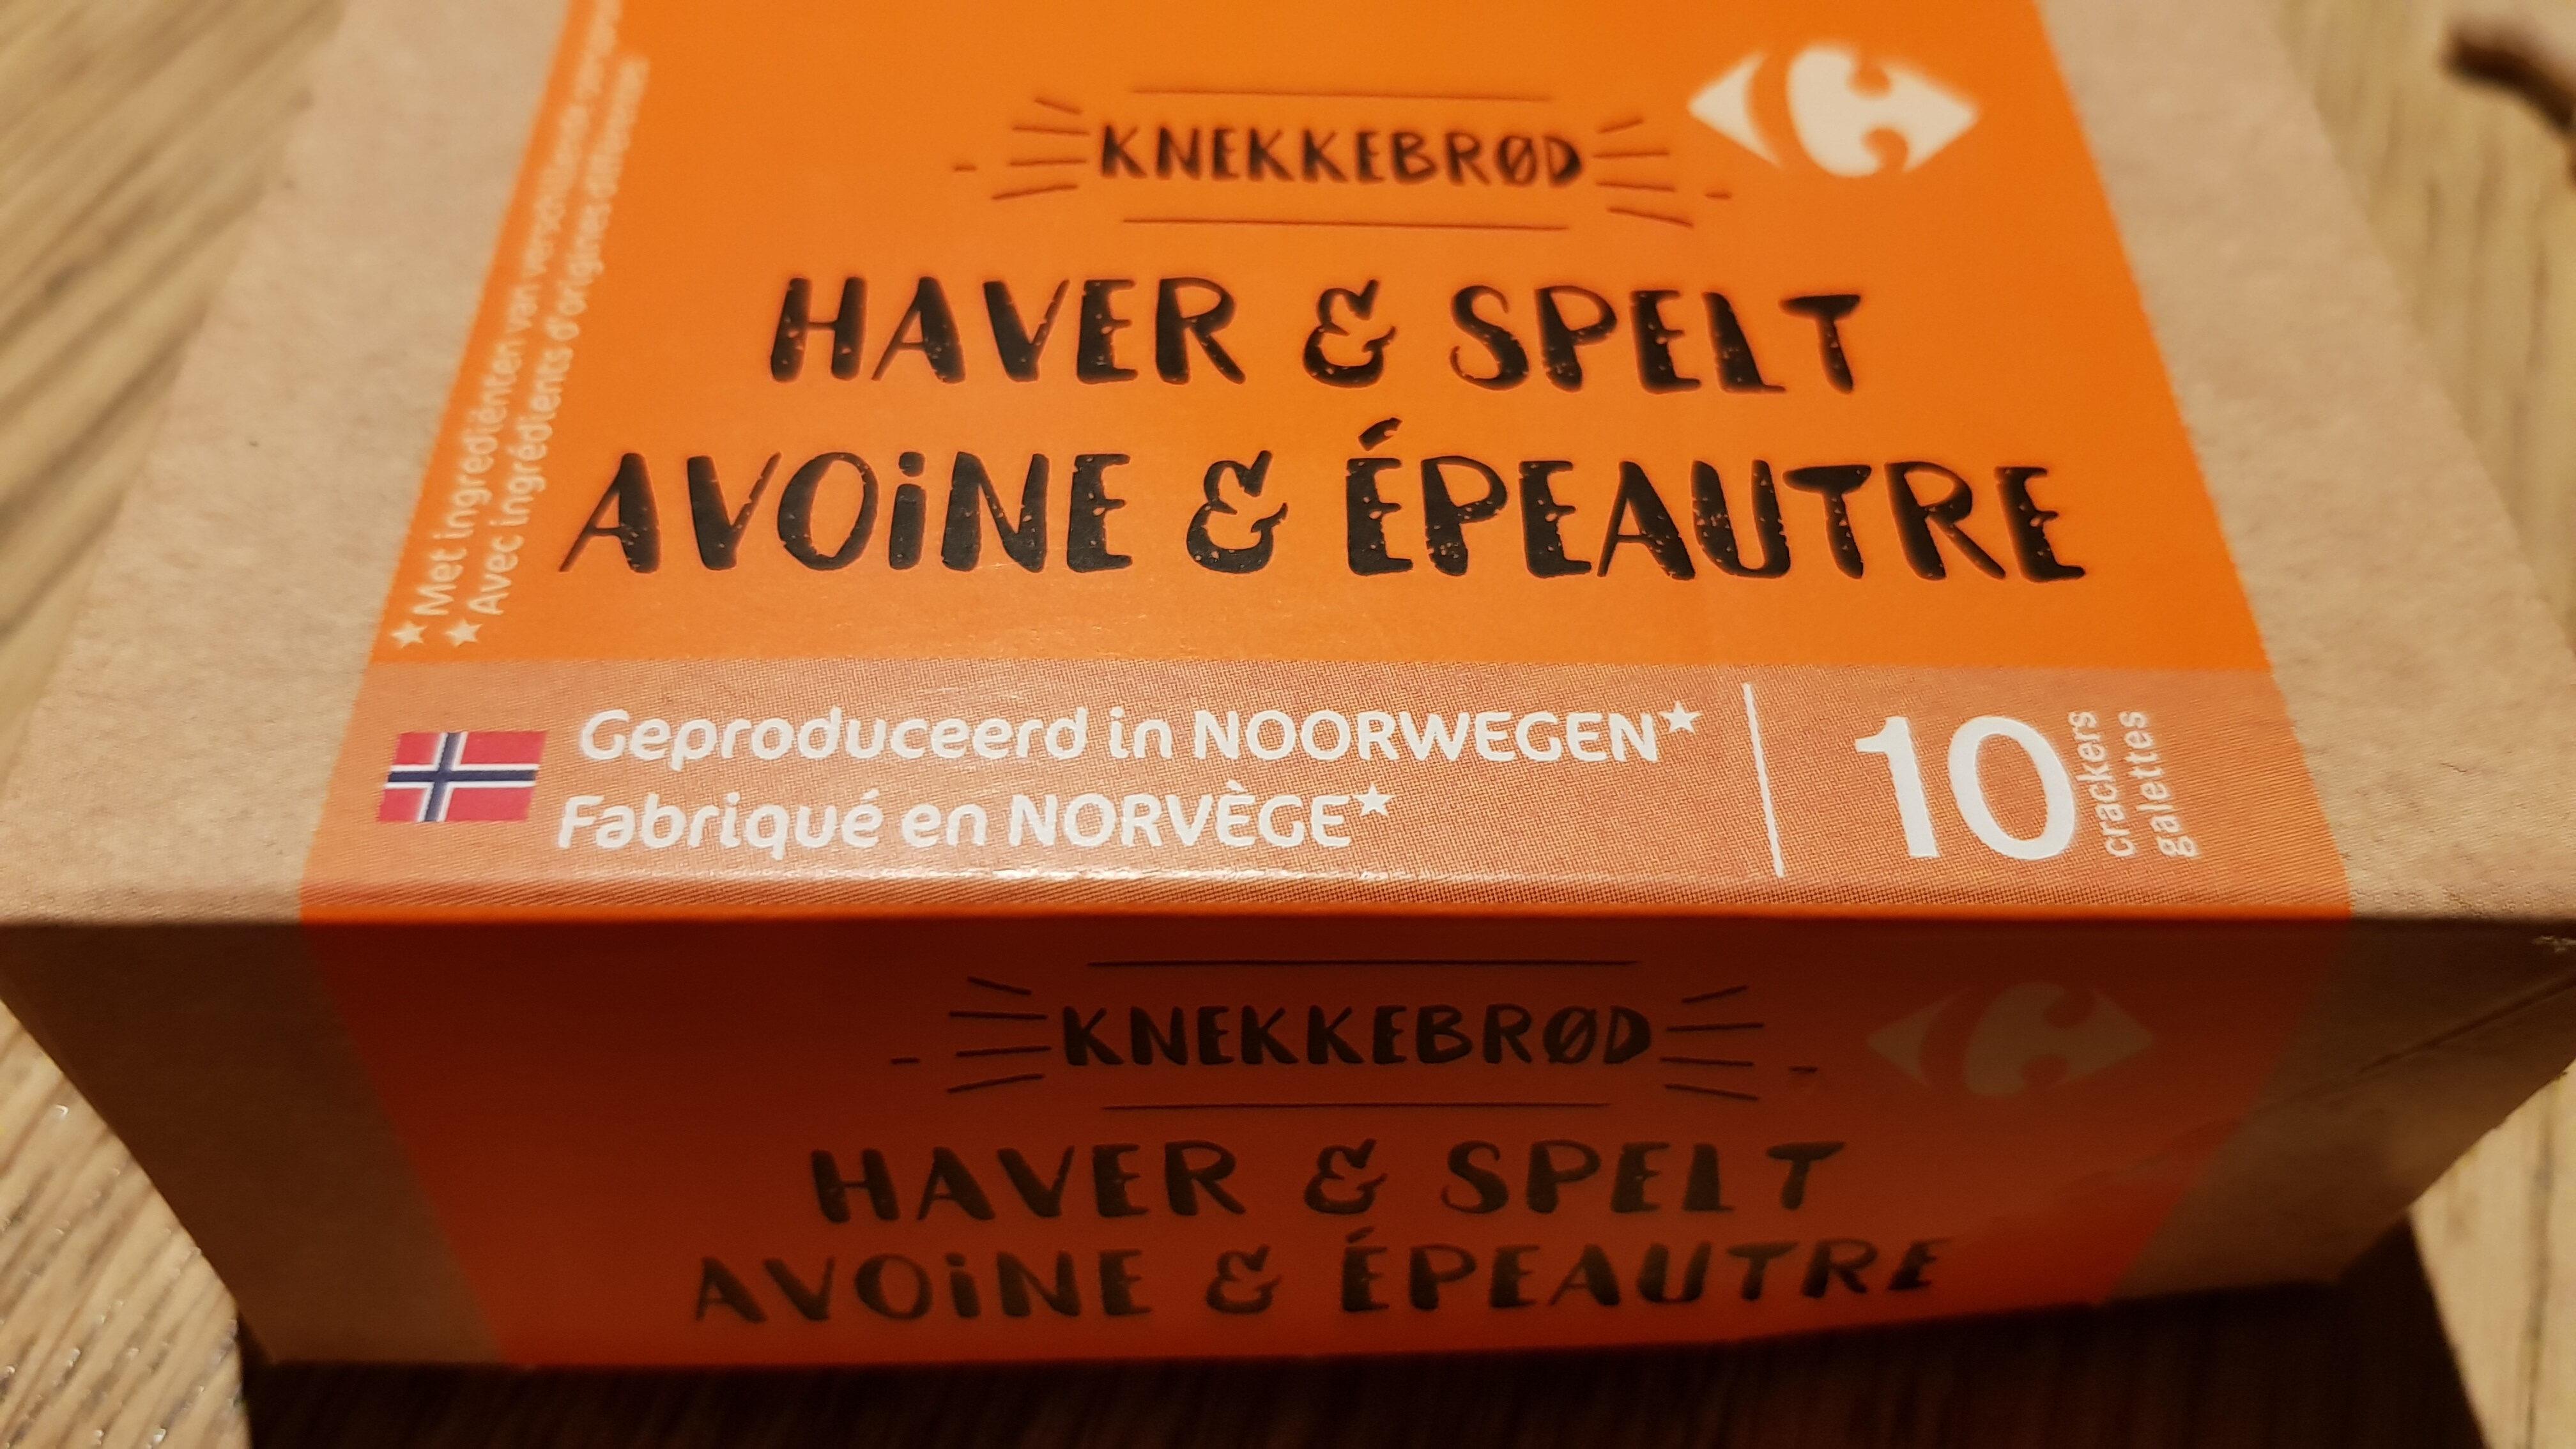 Knekkebrod avoine & épeautre - Product - nl